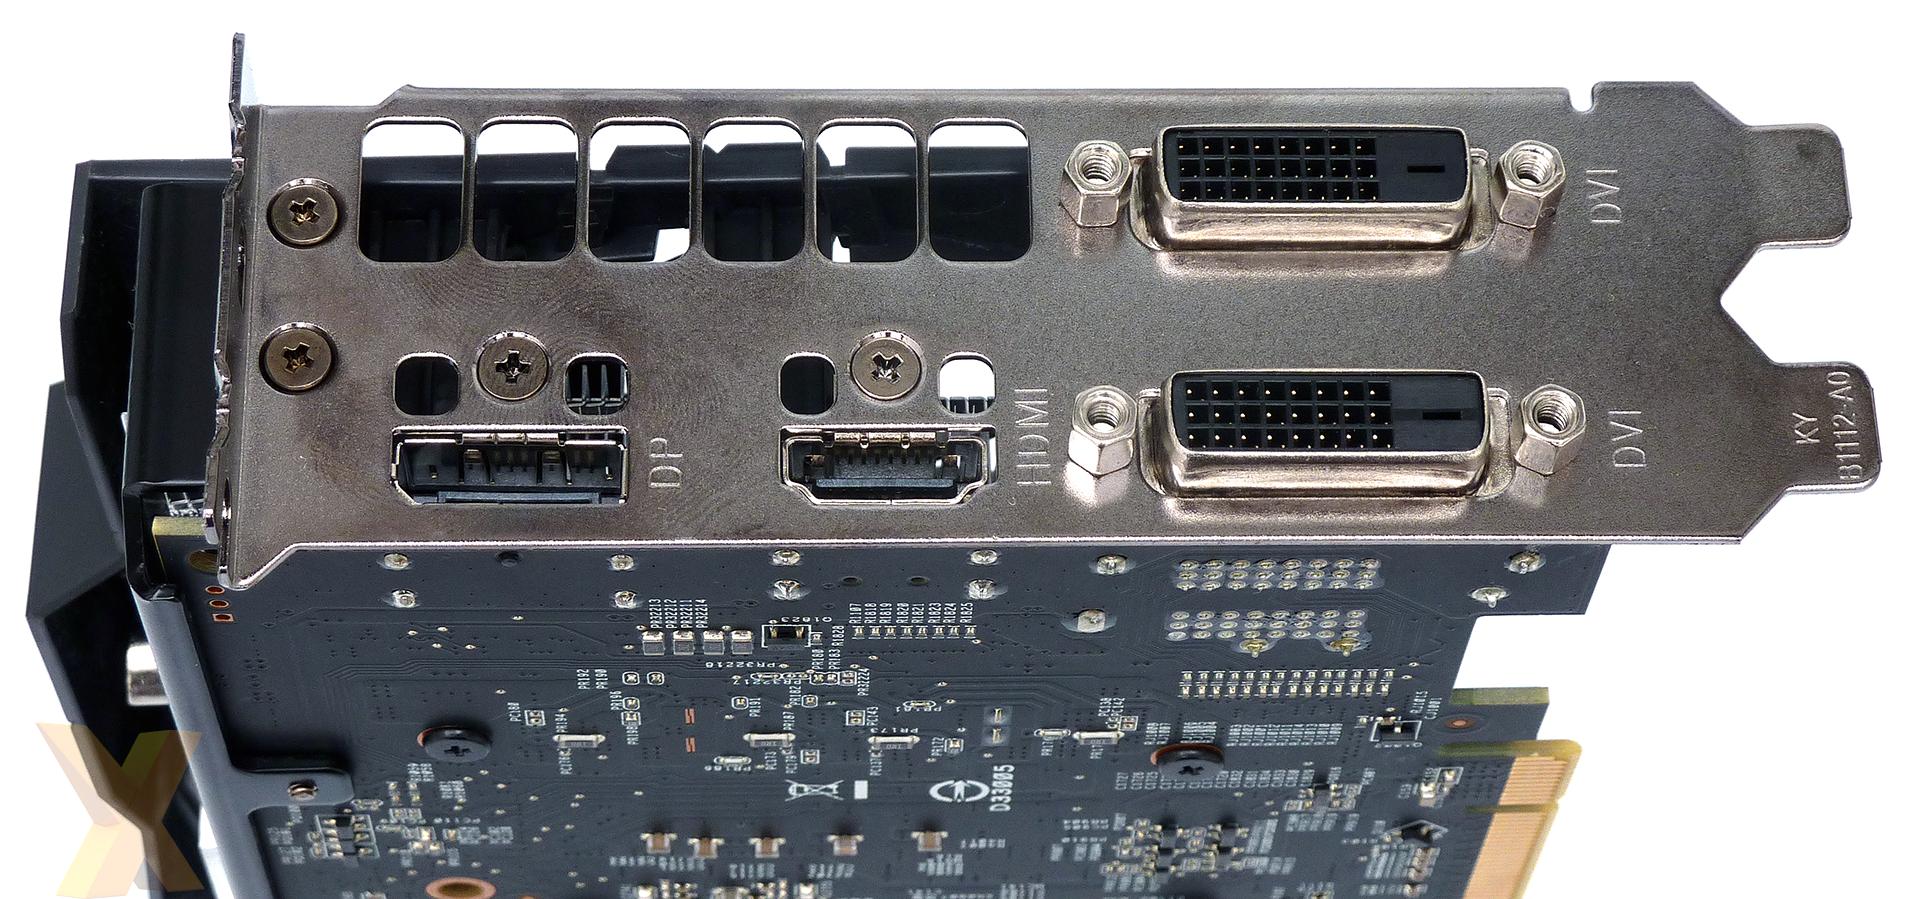 Review: Asus Radeon RX 470 Strix Gaming OC 4GB - Graphics